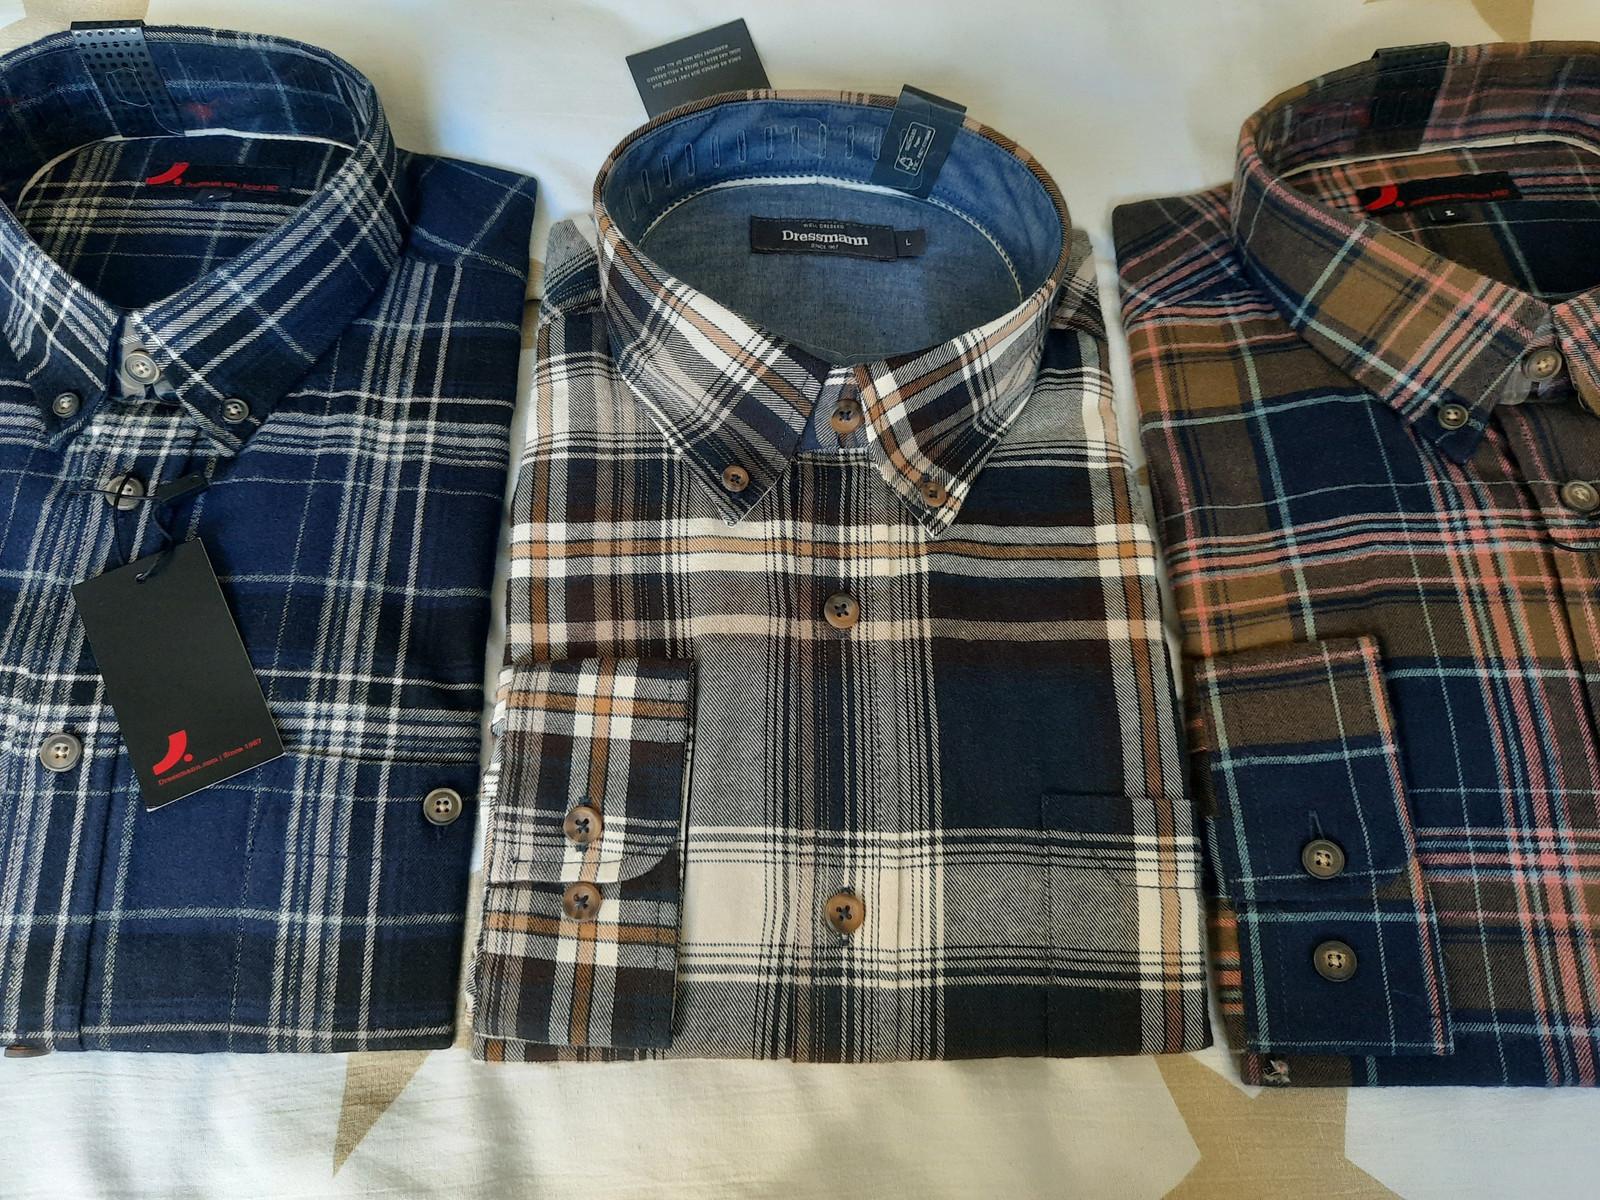 Dressmann skjorter str M | FINN.no